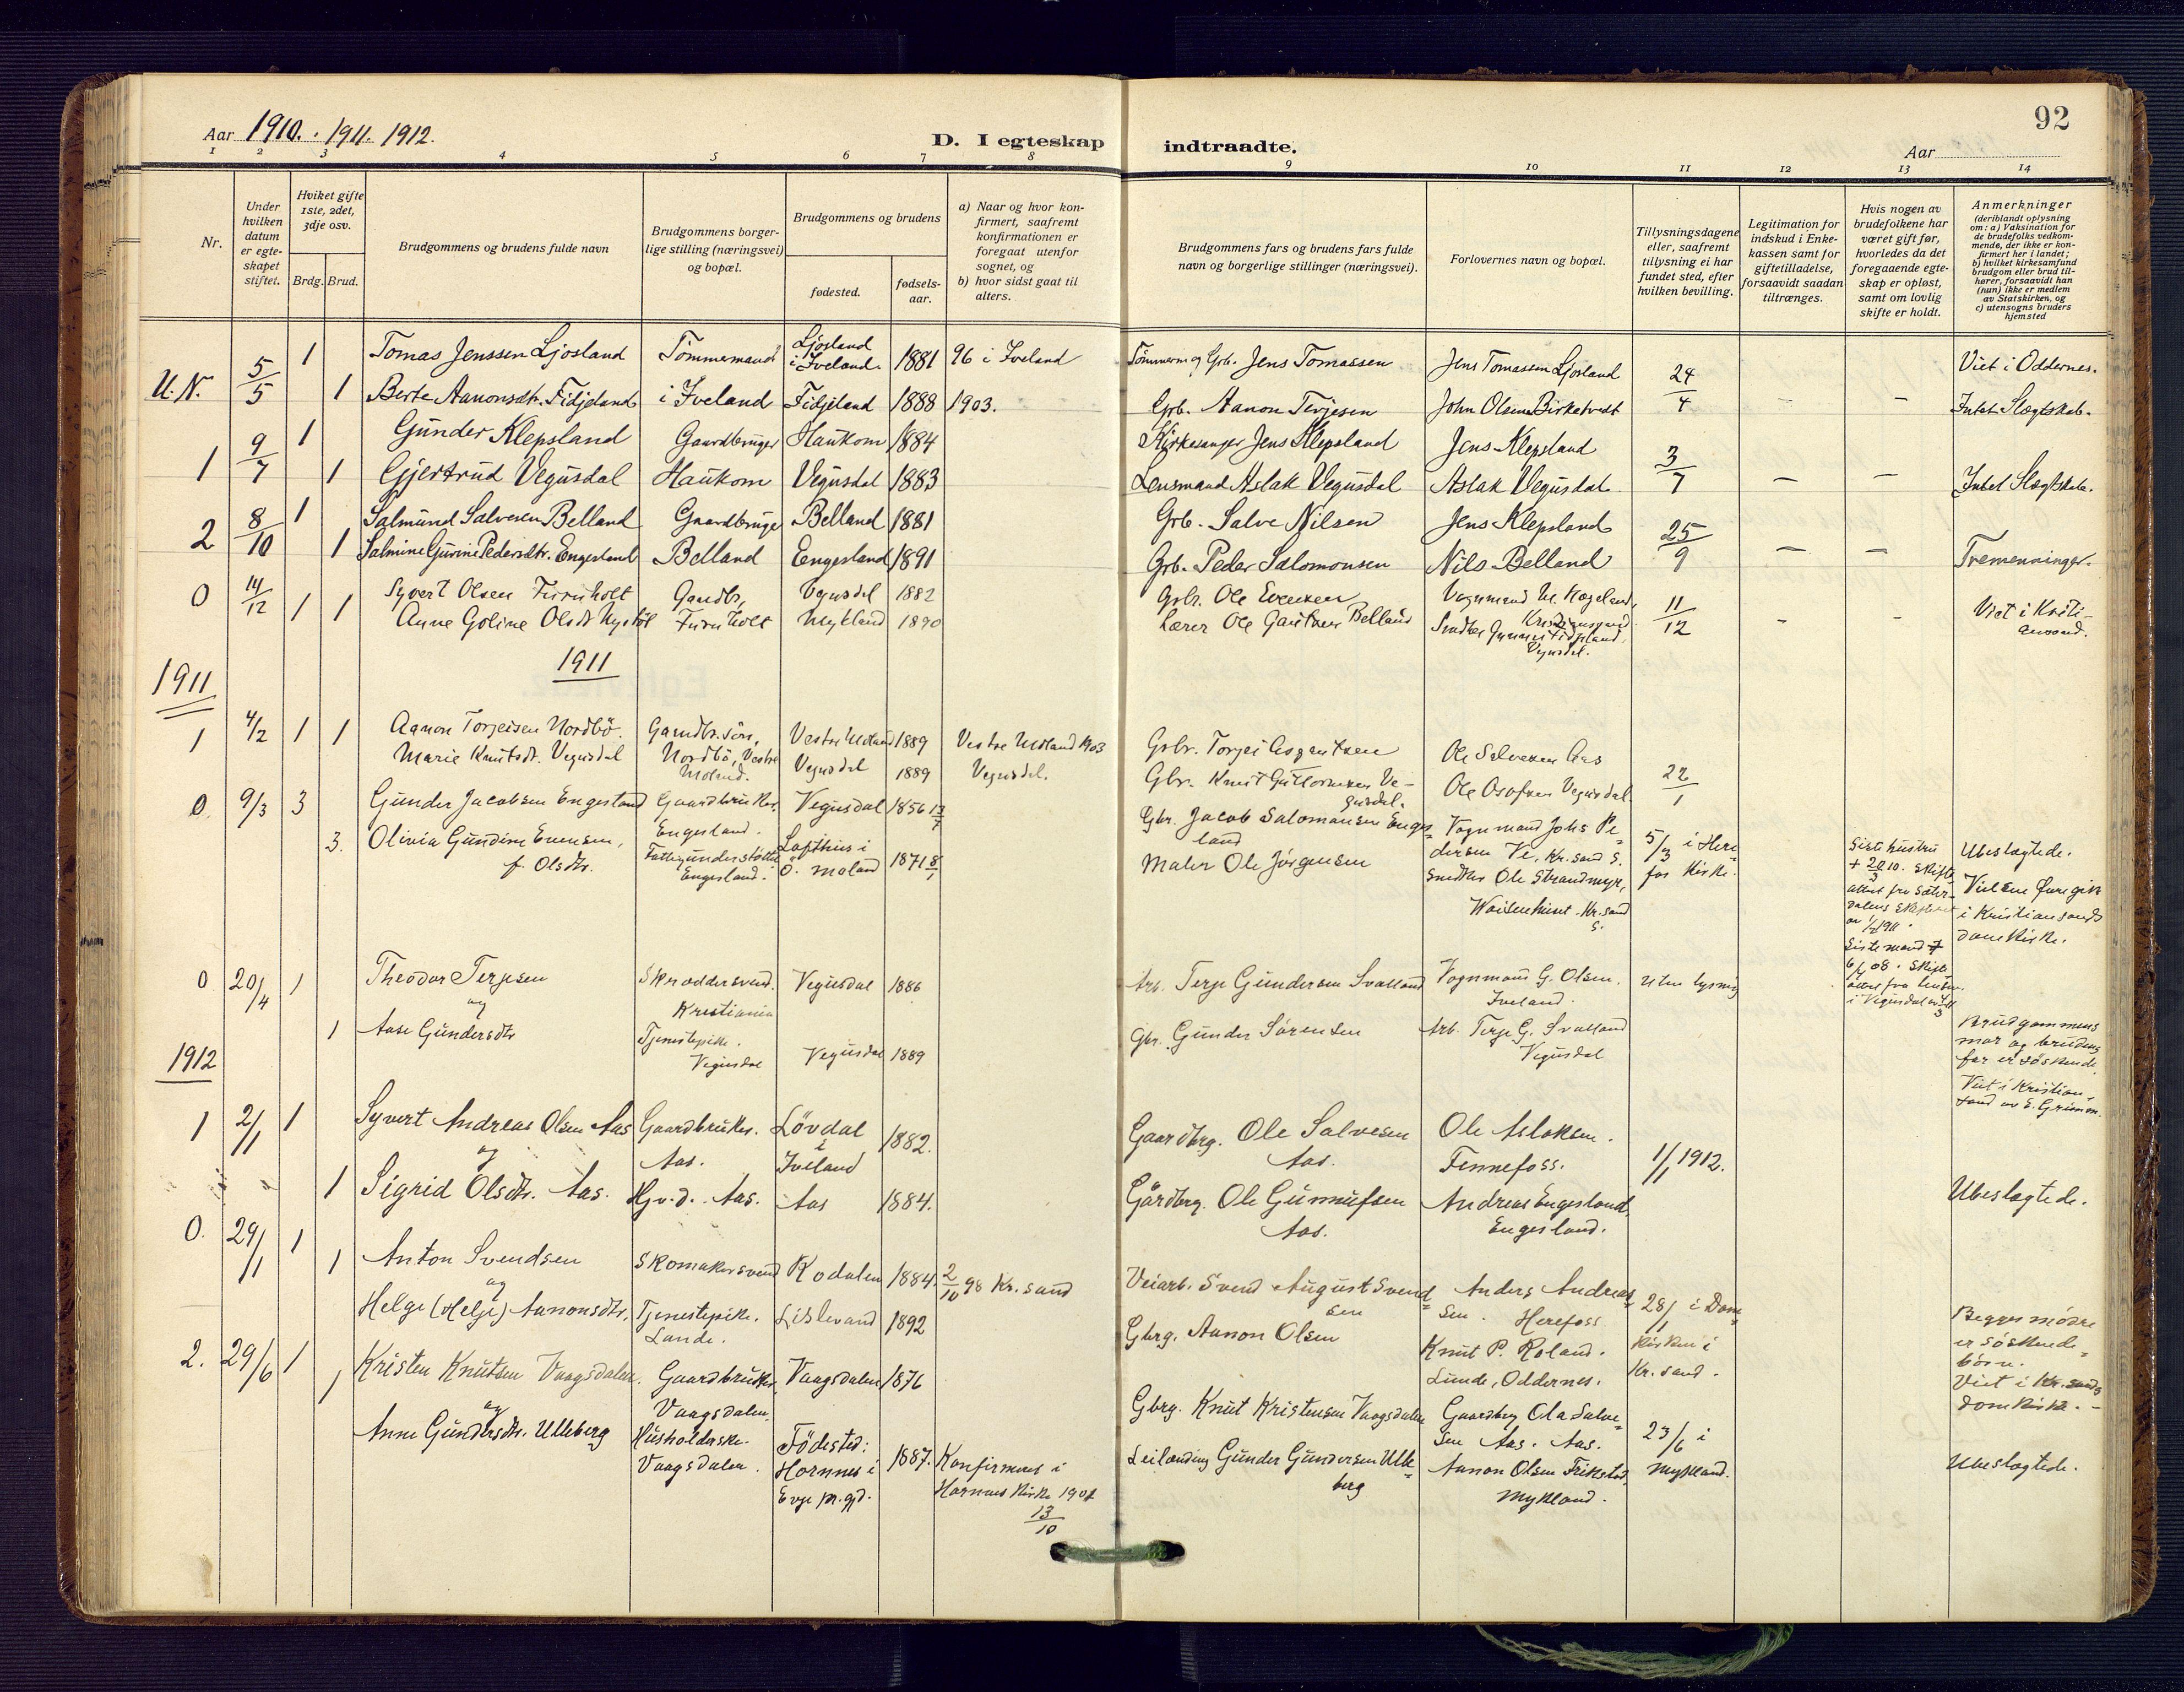 SAK, Herefoss sokneprestkontor, F/Fa/Fab/L0005: Ministerialbok nr. A 5, 1910-1932, s. 92